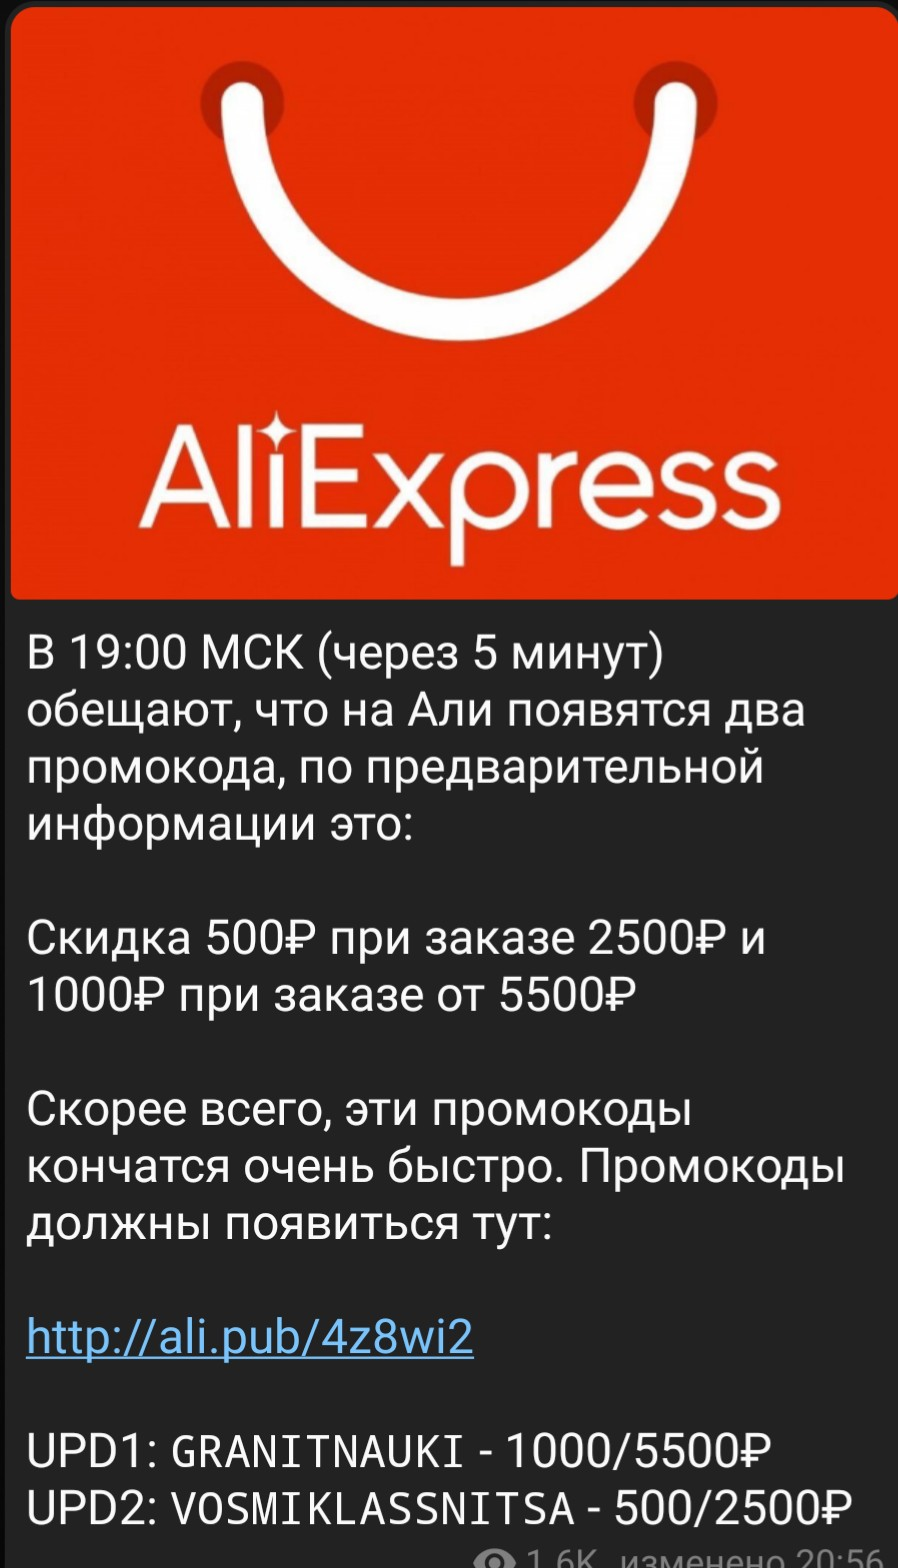 Screenshot_2020-08-05-21-08-19-1619613292_EDIT_1.jpg